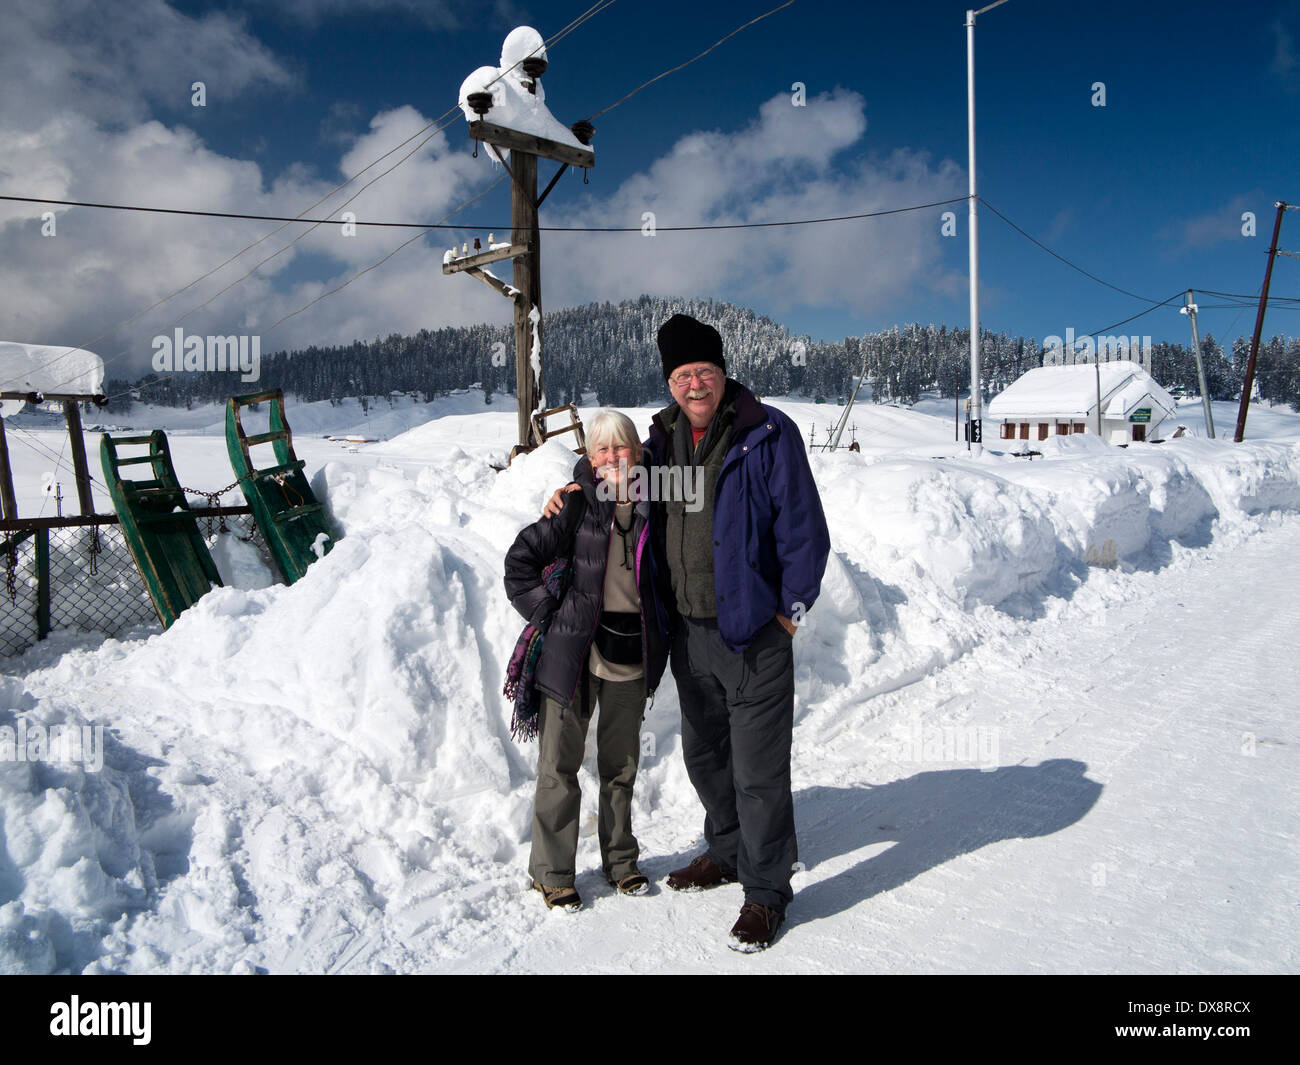 india, kashmir, gulmarg, himalayan ski resort main bazaar, happy